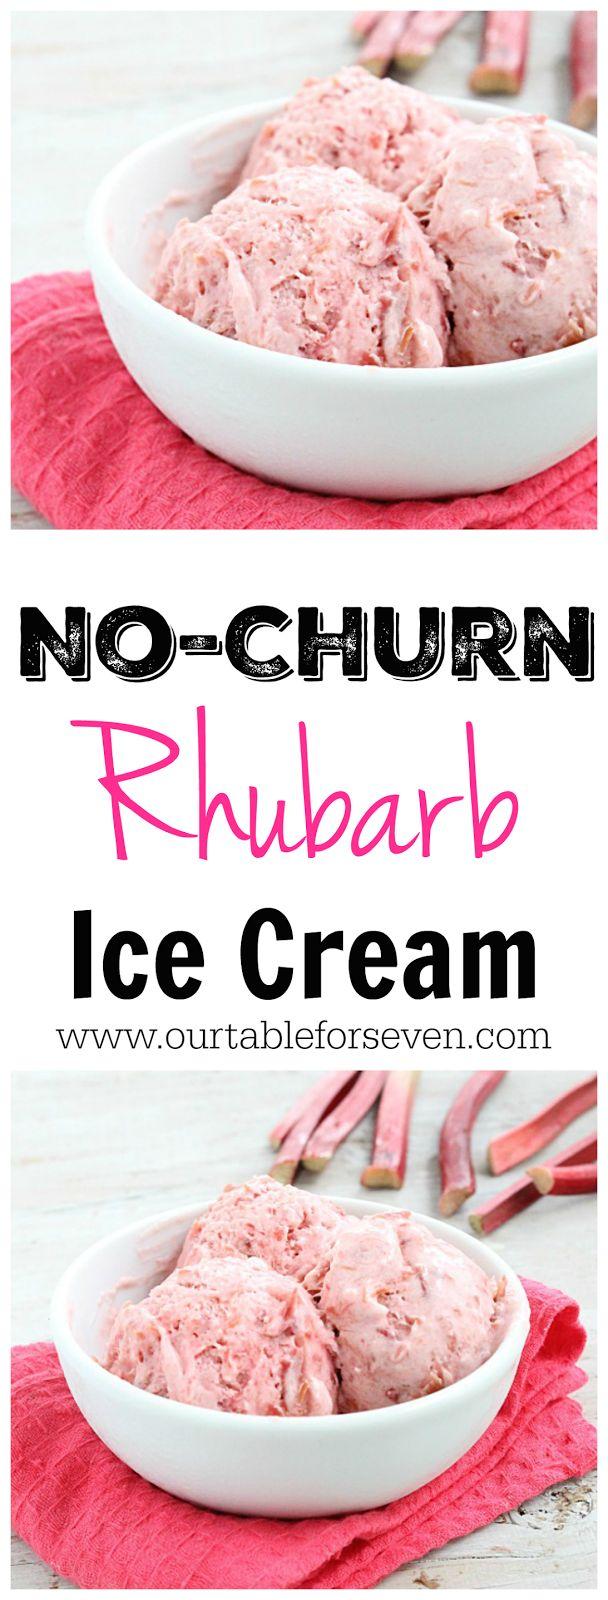 No Churn Rhubarb Ice Cream